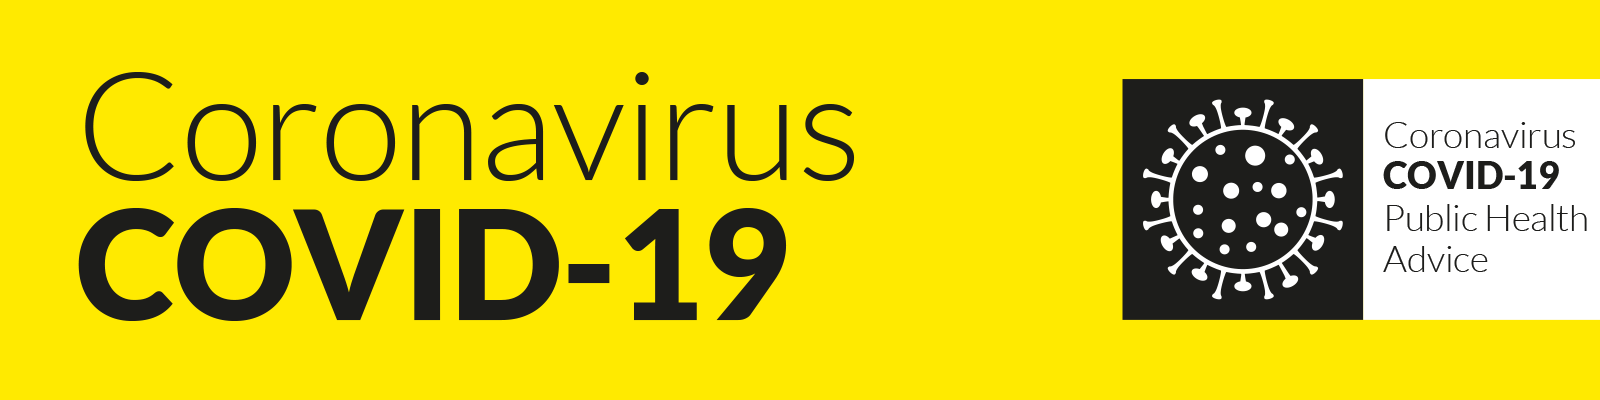 Coronavirus Covid-19 header